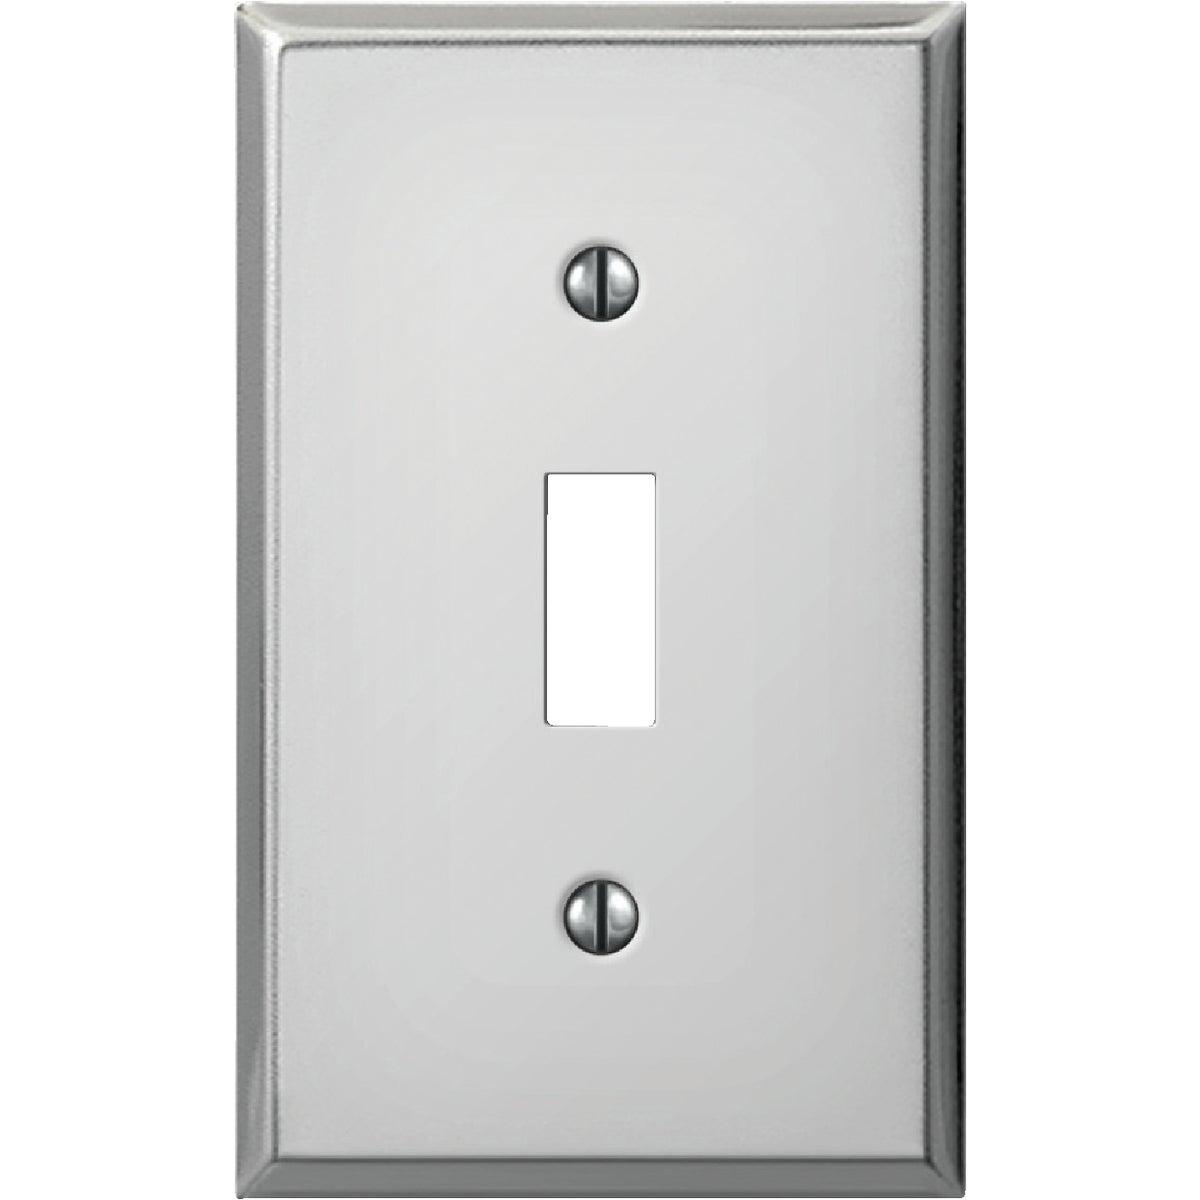 Jackson-Deerfield Mfg. Pro-Polished Chrome Steel Switch Wall Plate